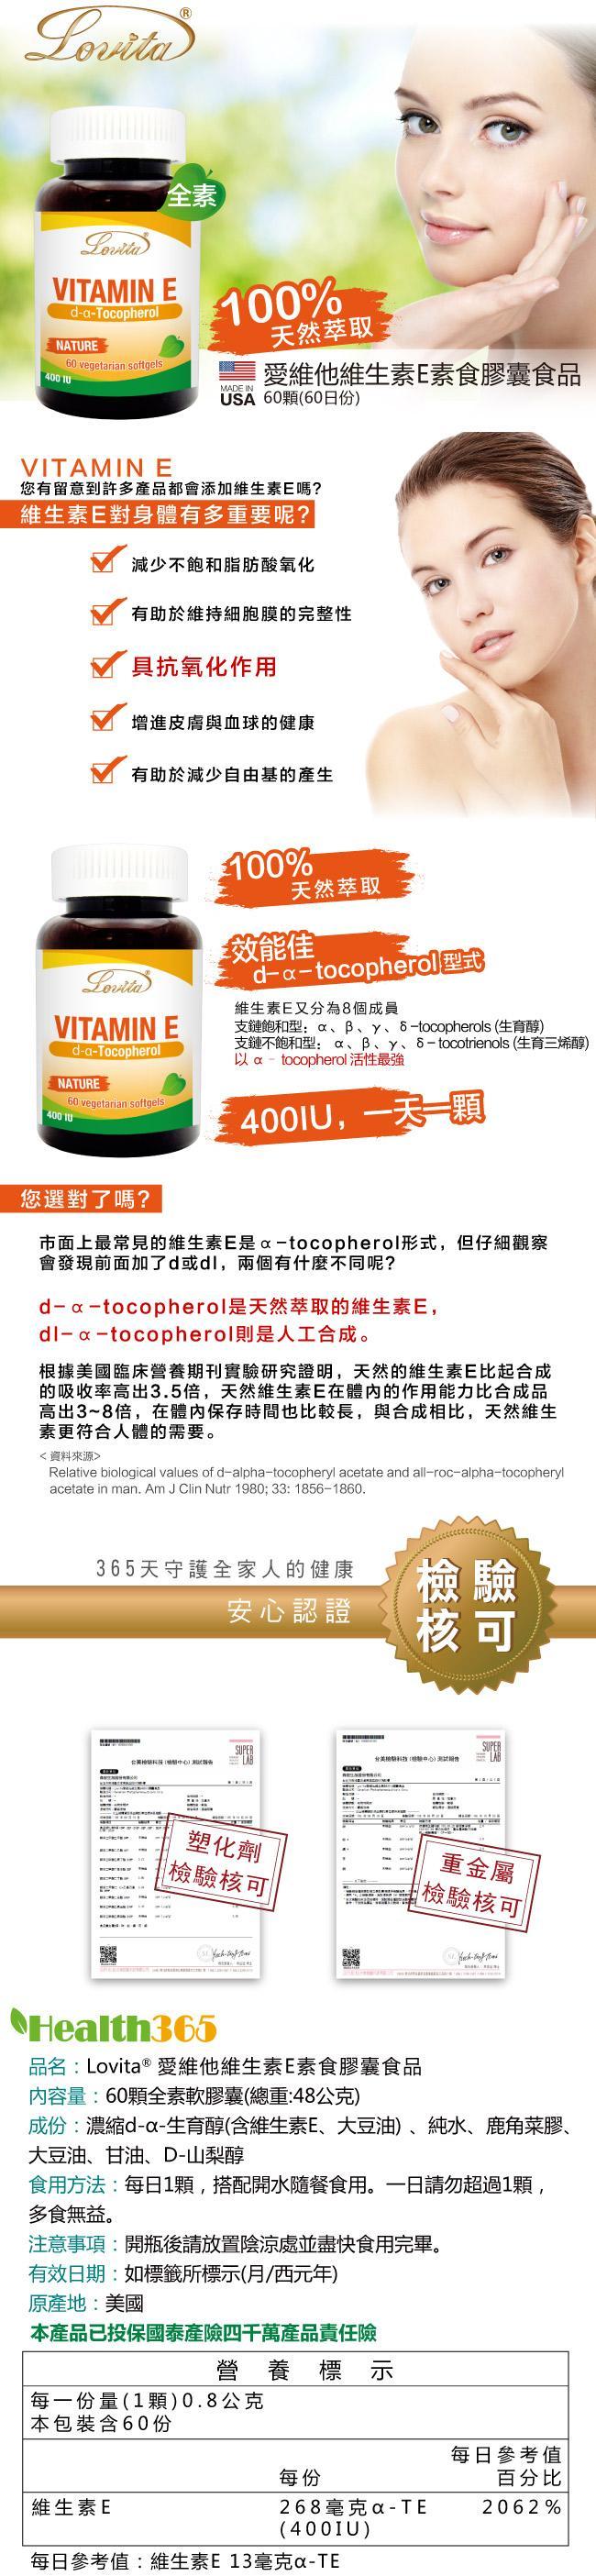 Lovita愛維他-天然維生素E膠囊400IU(60粒-60天份)產品資訊